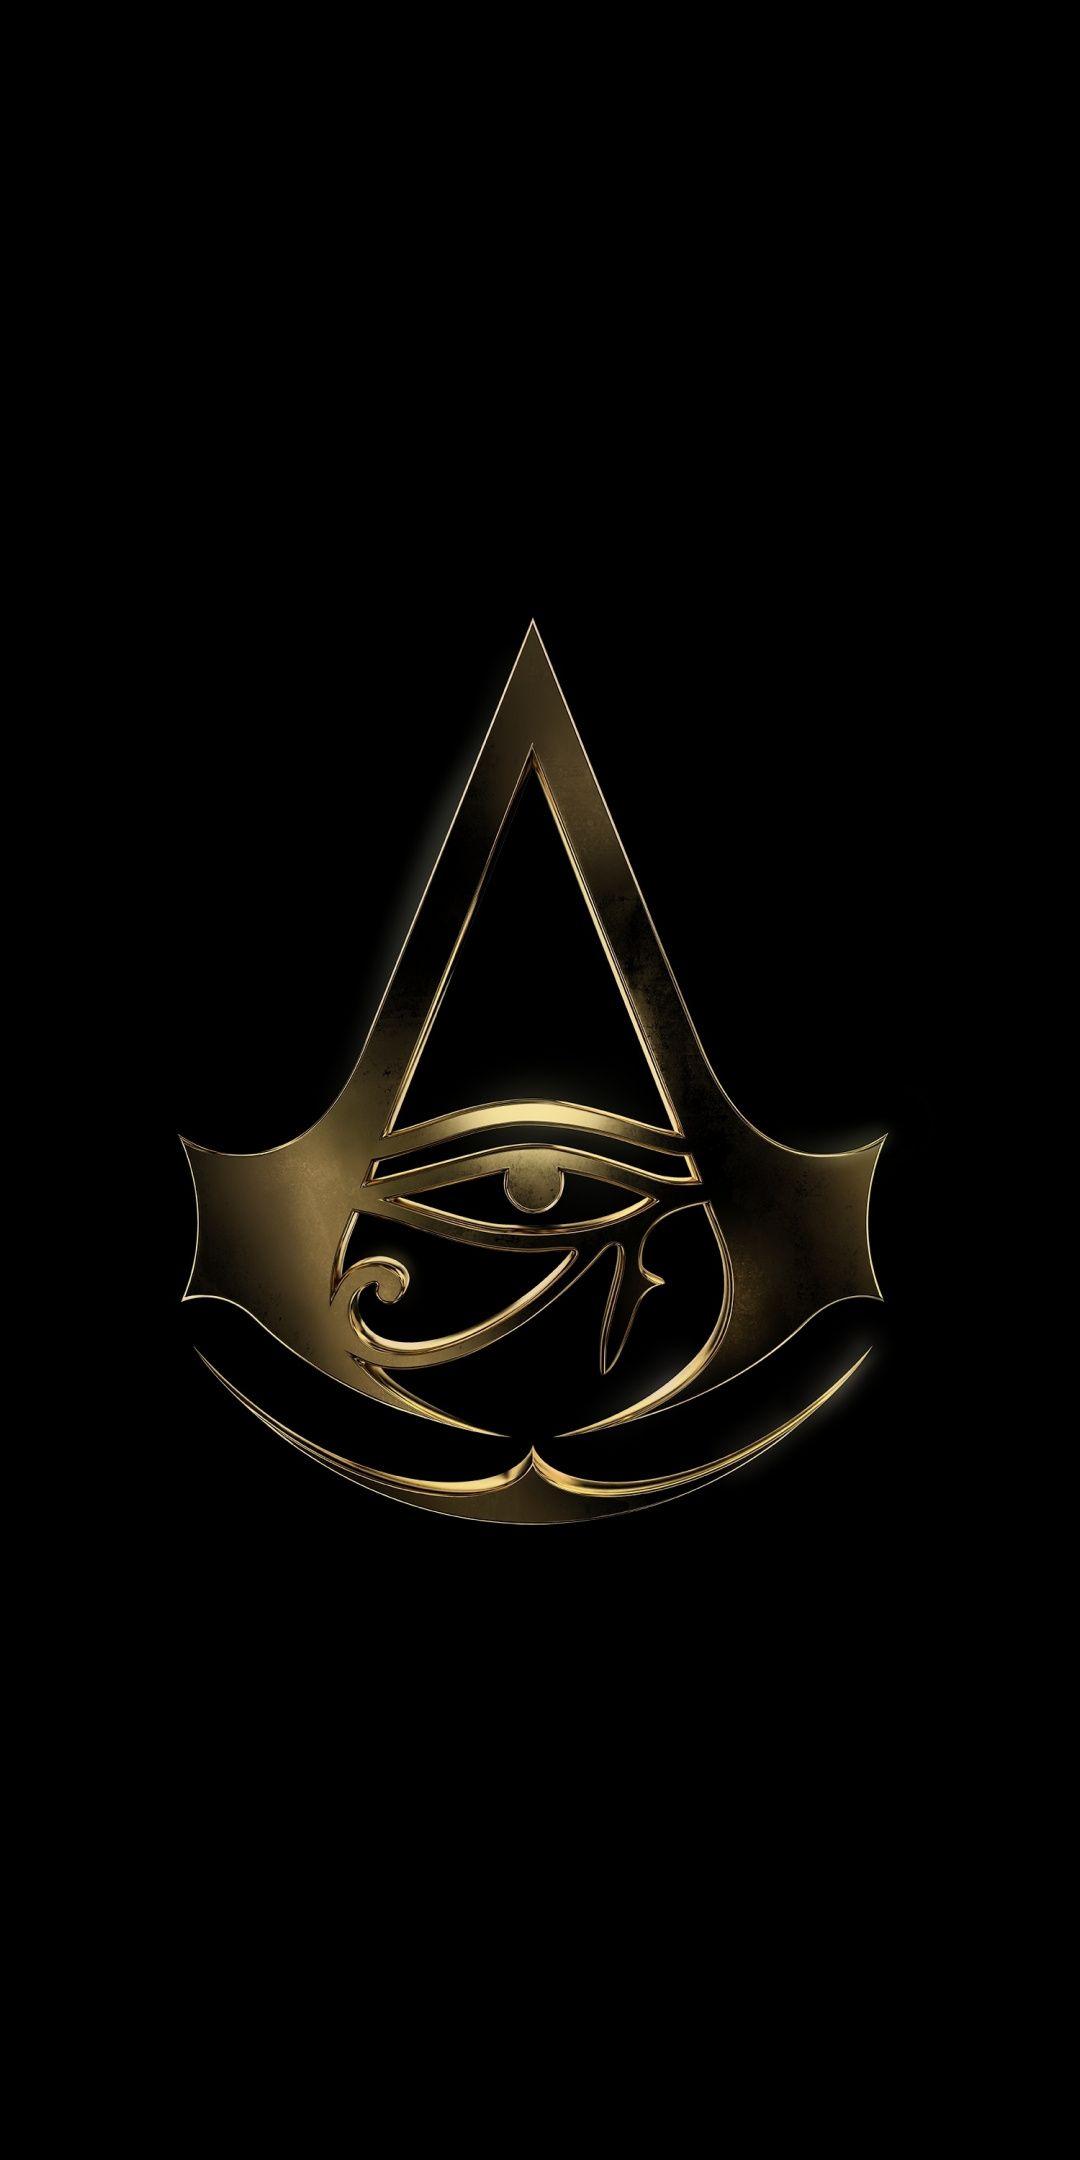 Assassins Creed Video Game Minimal 1080x2160 Wallpaper